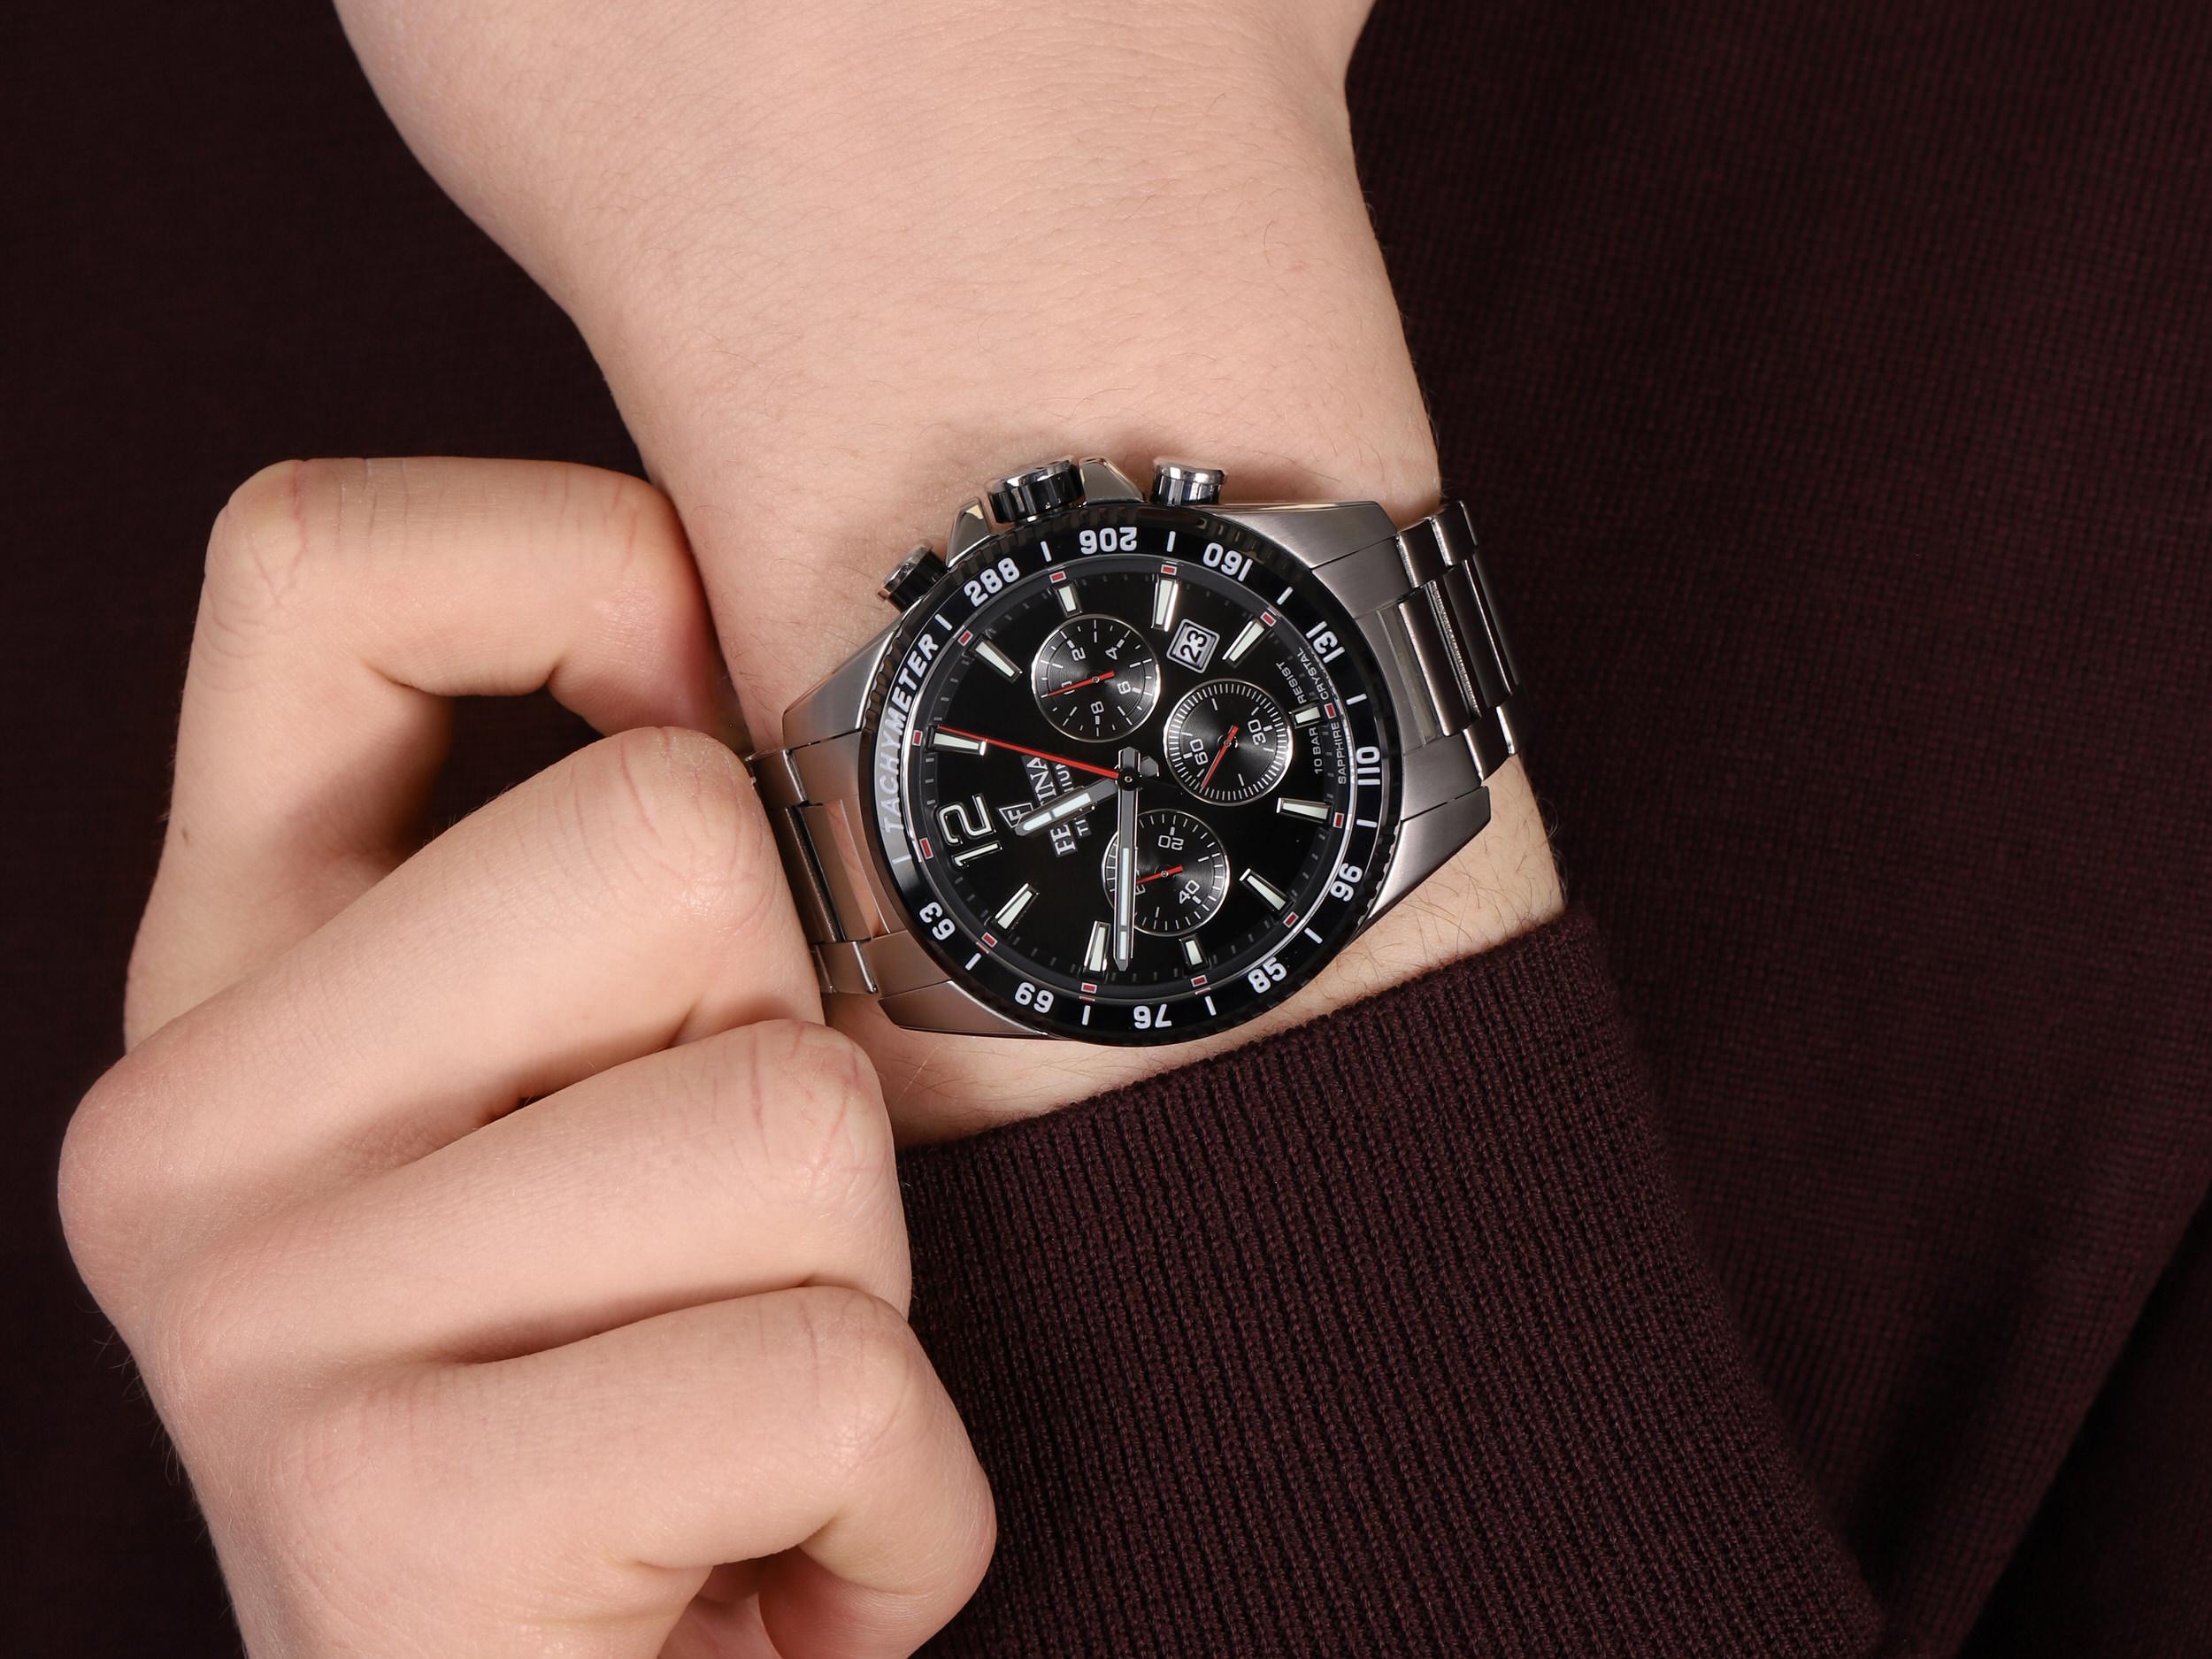 zegarek Festina F20520-4 Titanium Sport Chrono Sapphire męski z tachometr Titanium